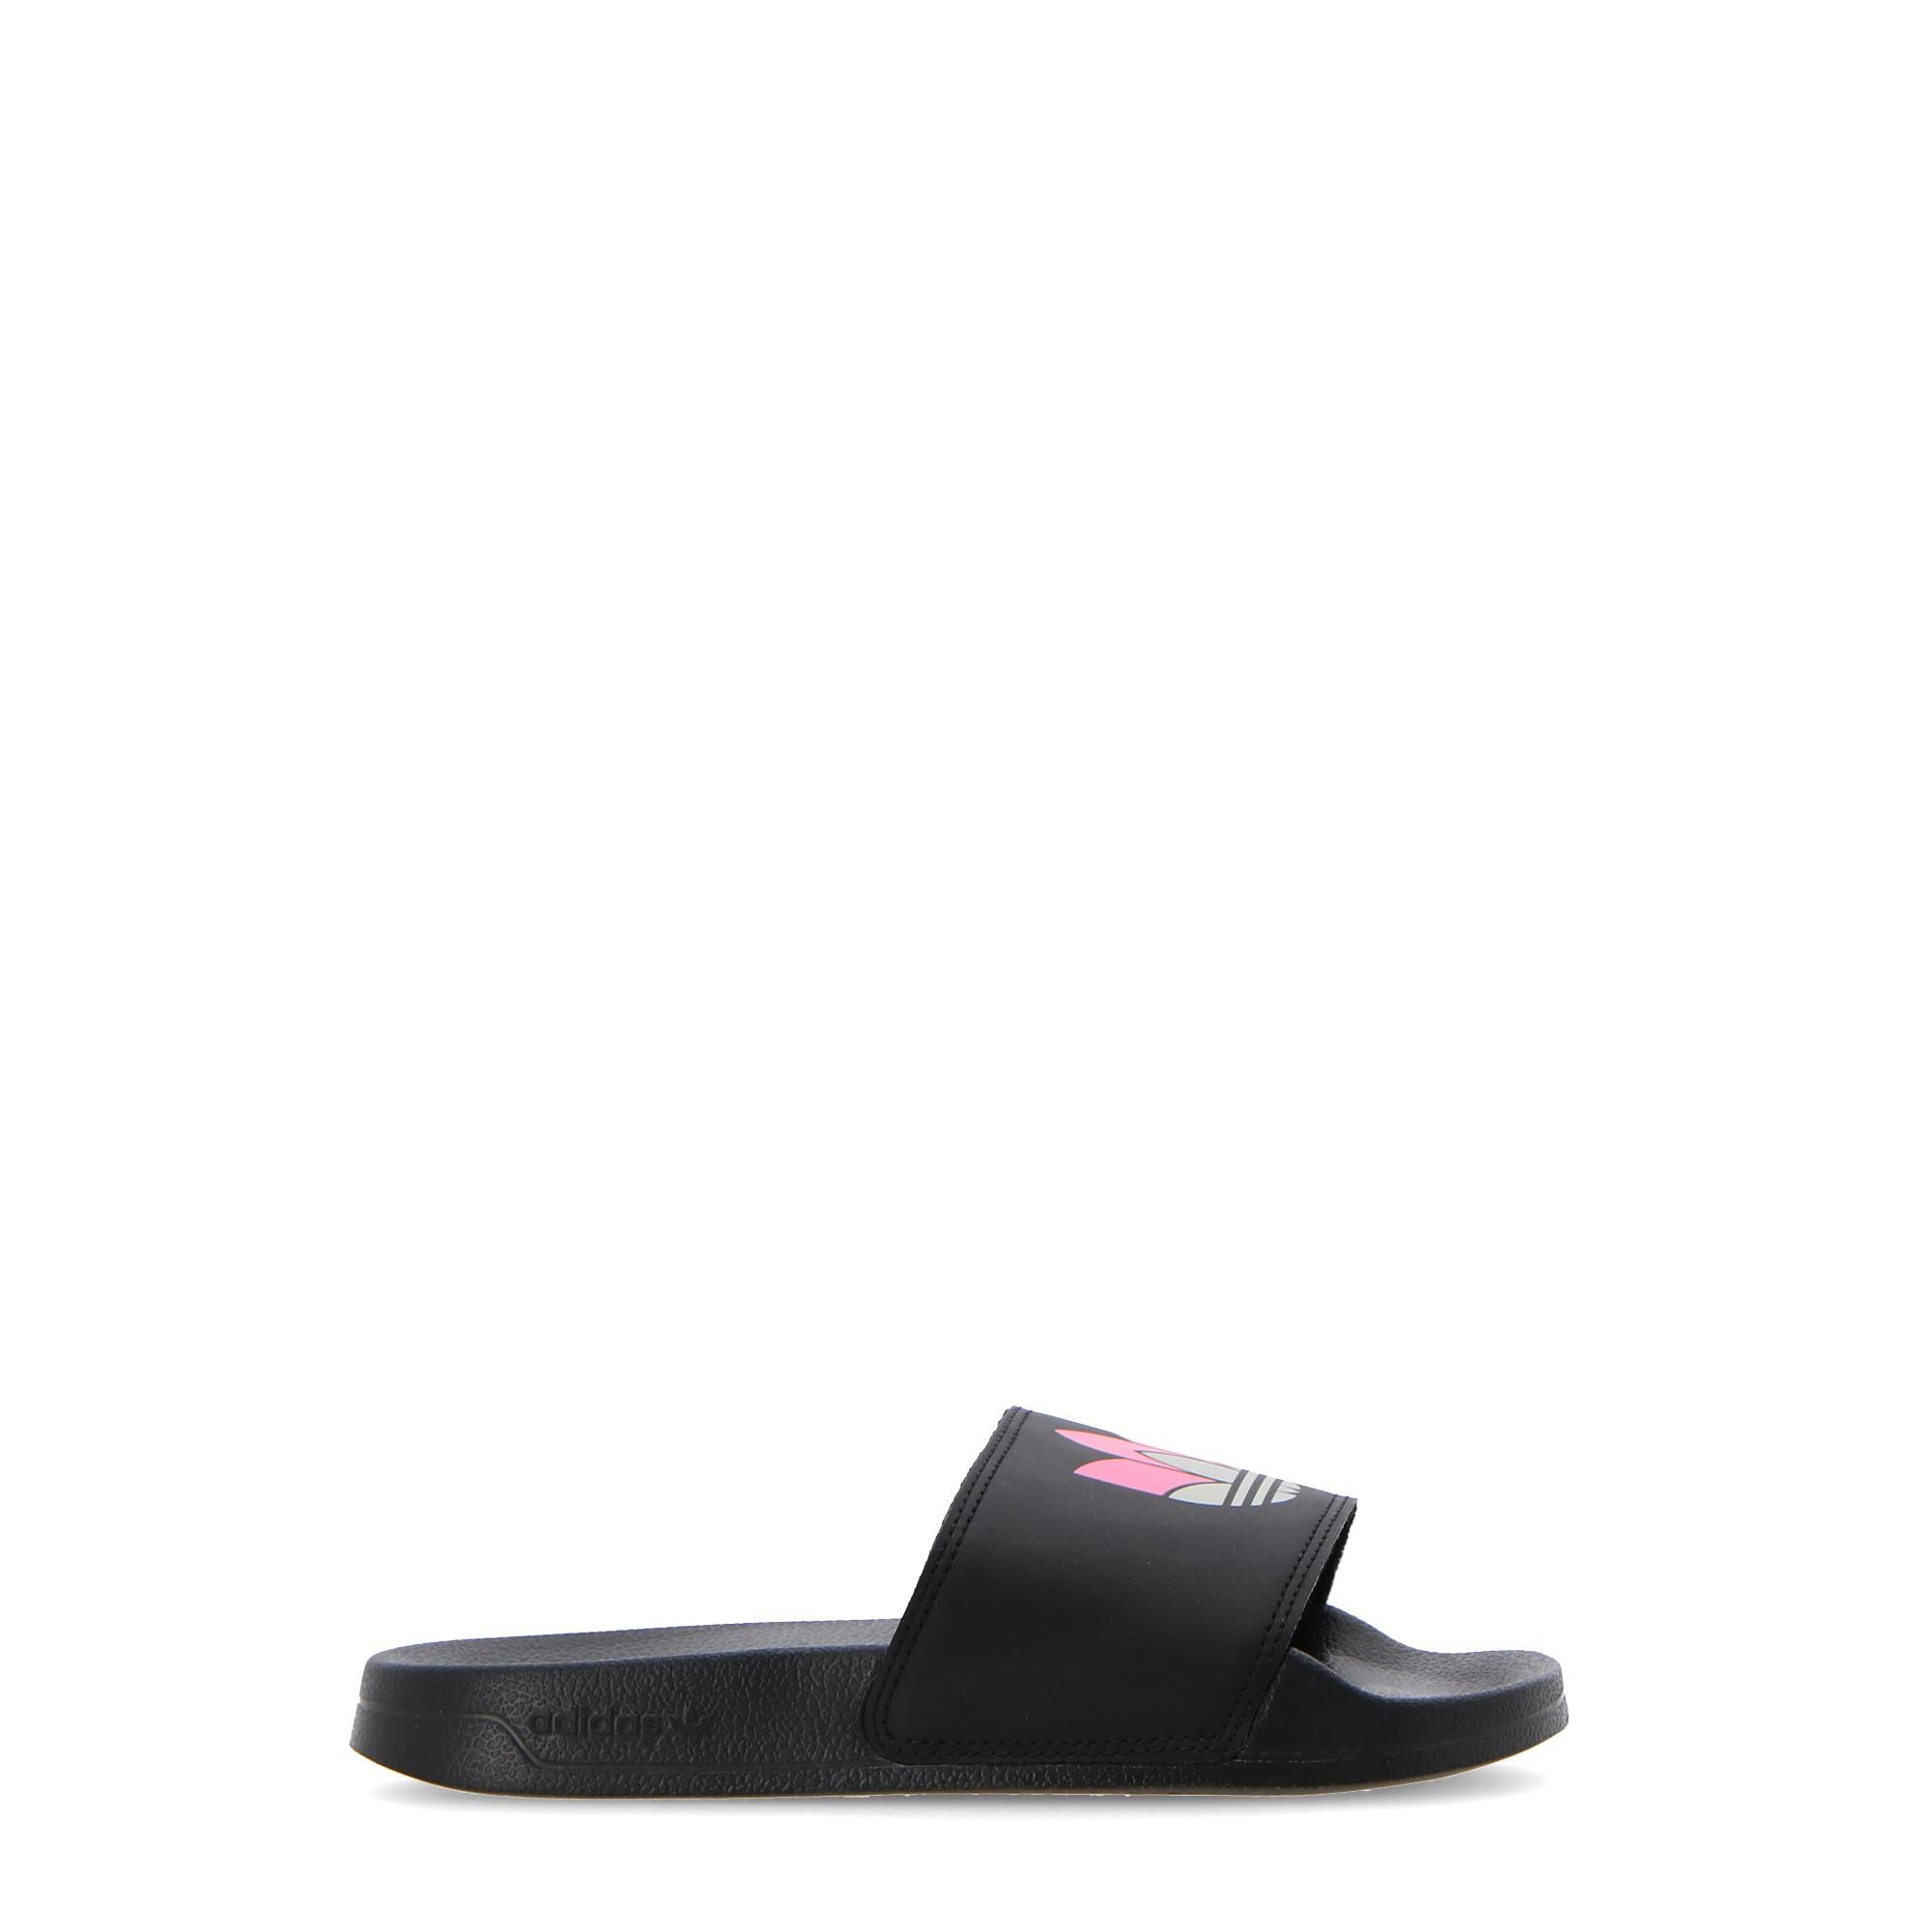 Adidas Adilette Lite W Core black grey two shock pink